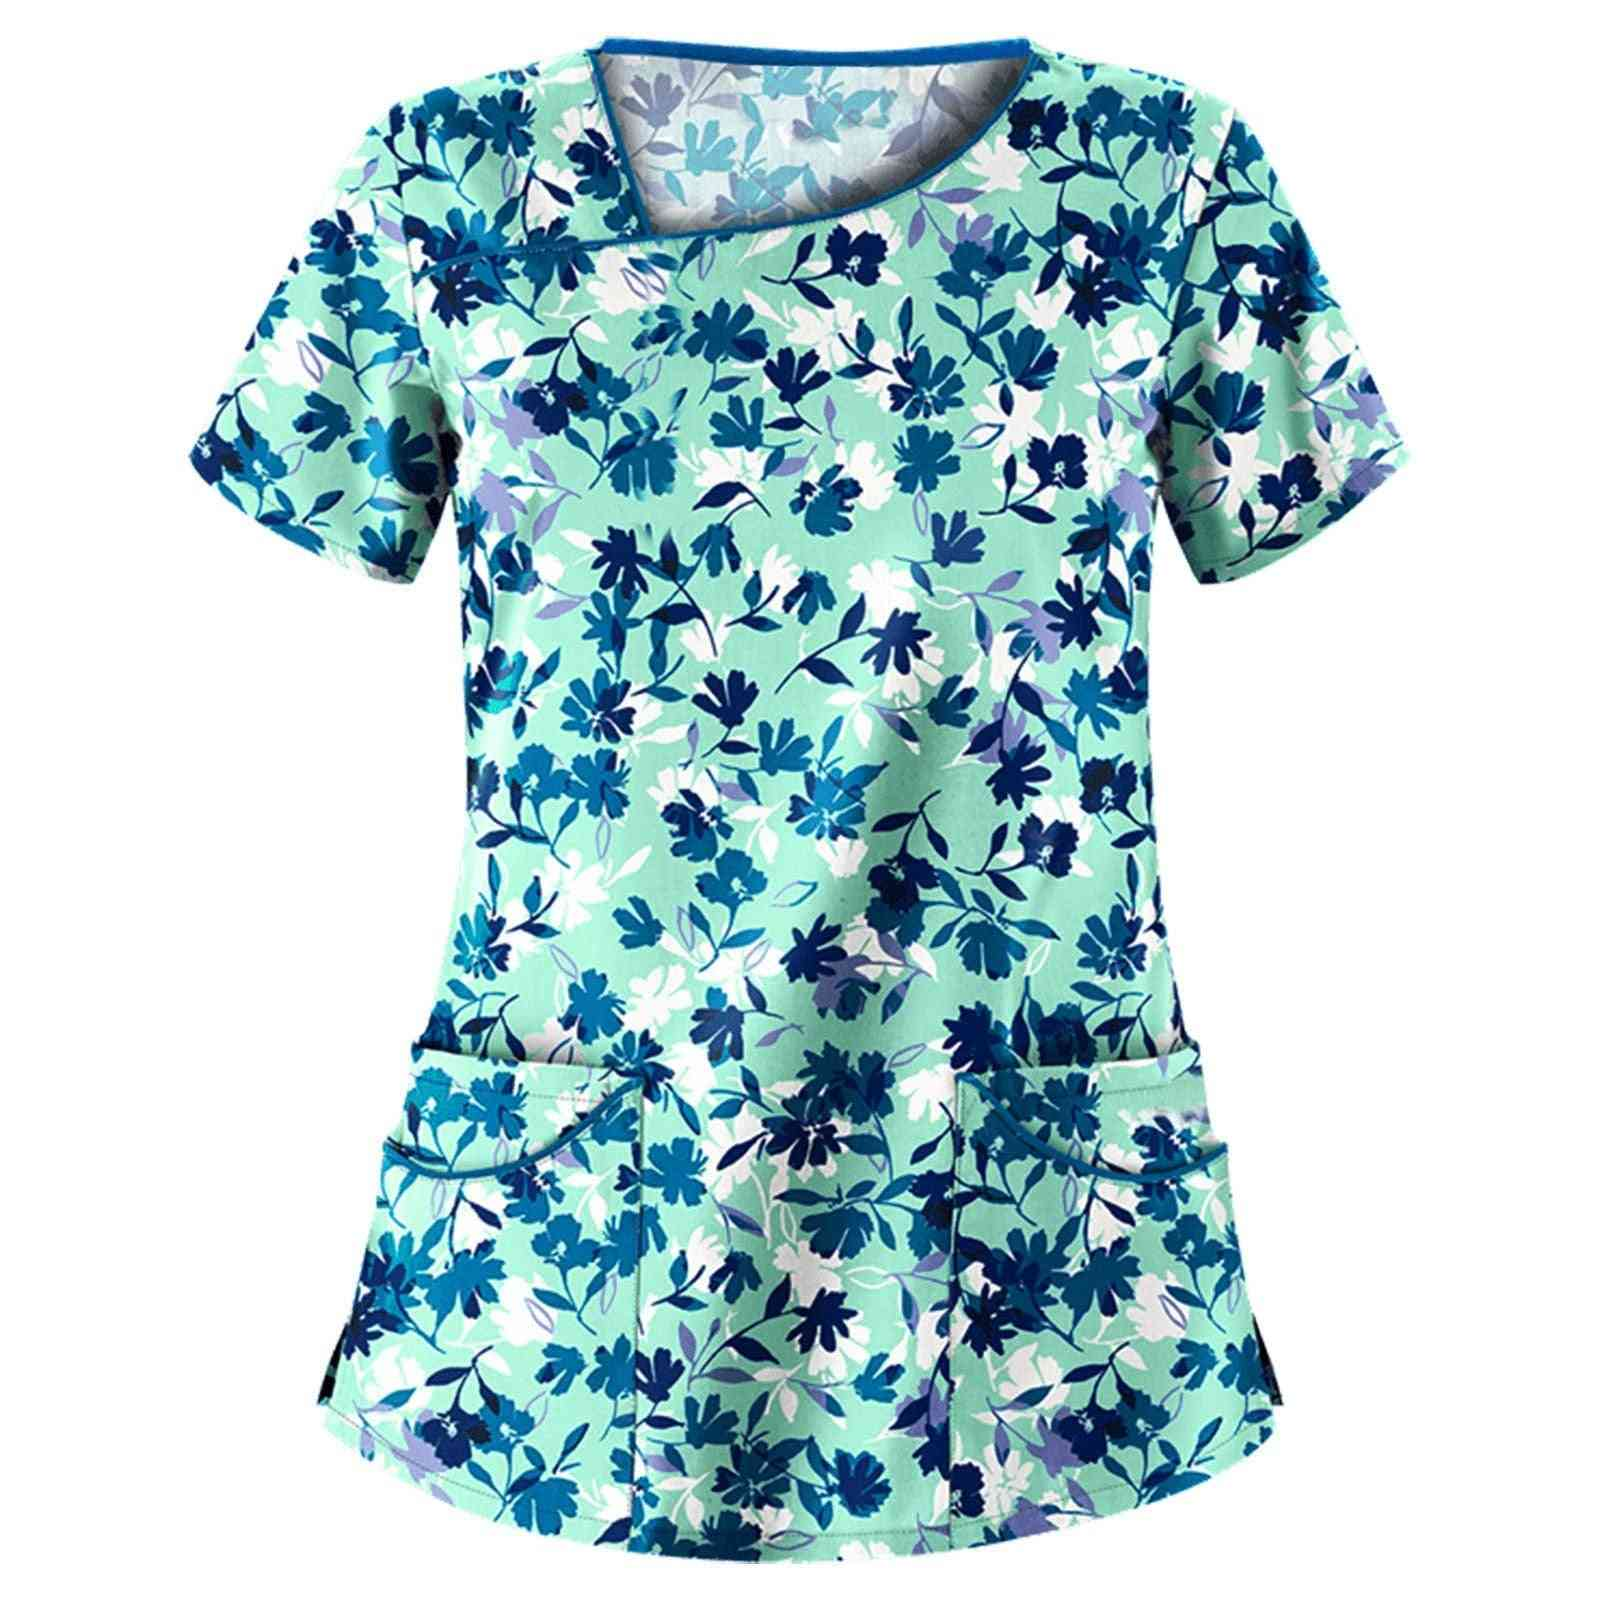 Women Fashion Short Sleeve V-neck Neck Tops Working Uniform Blouse Shirt